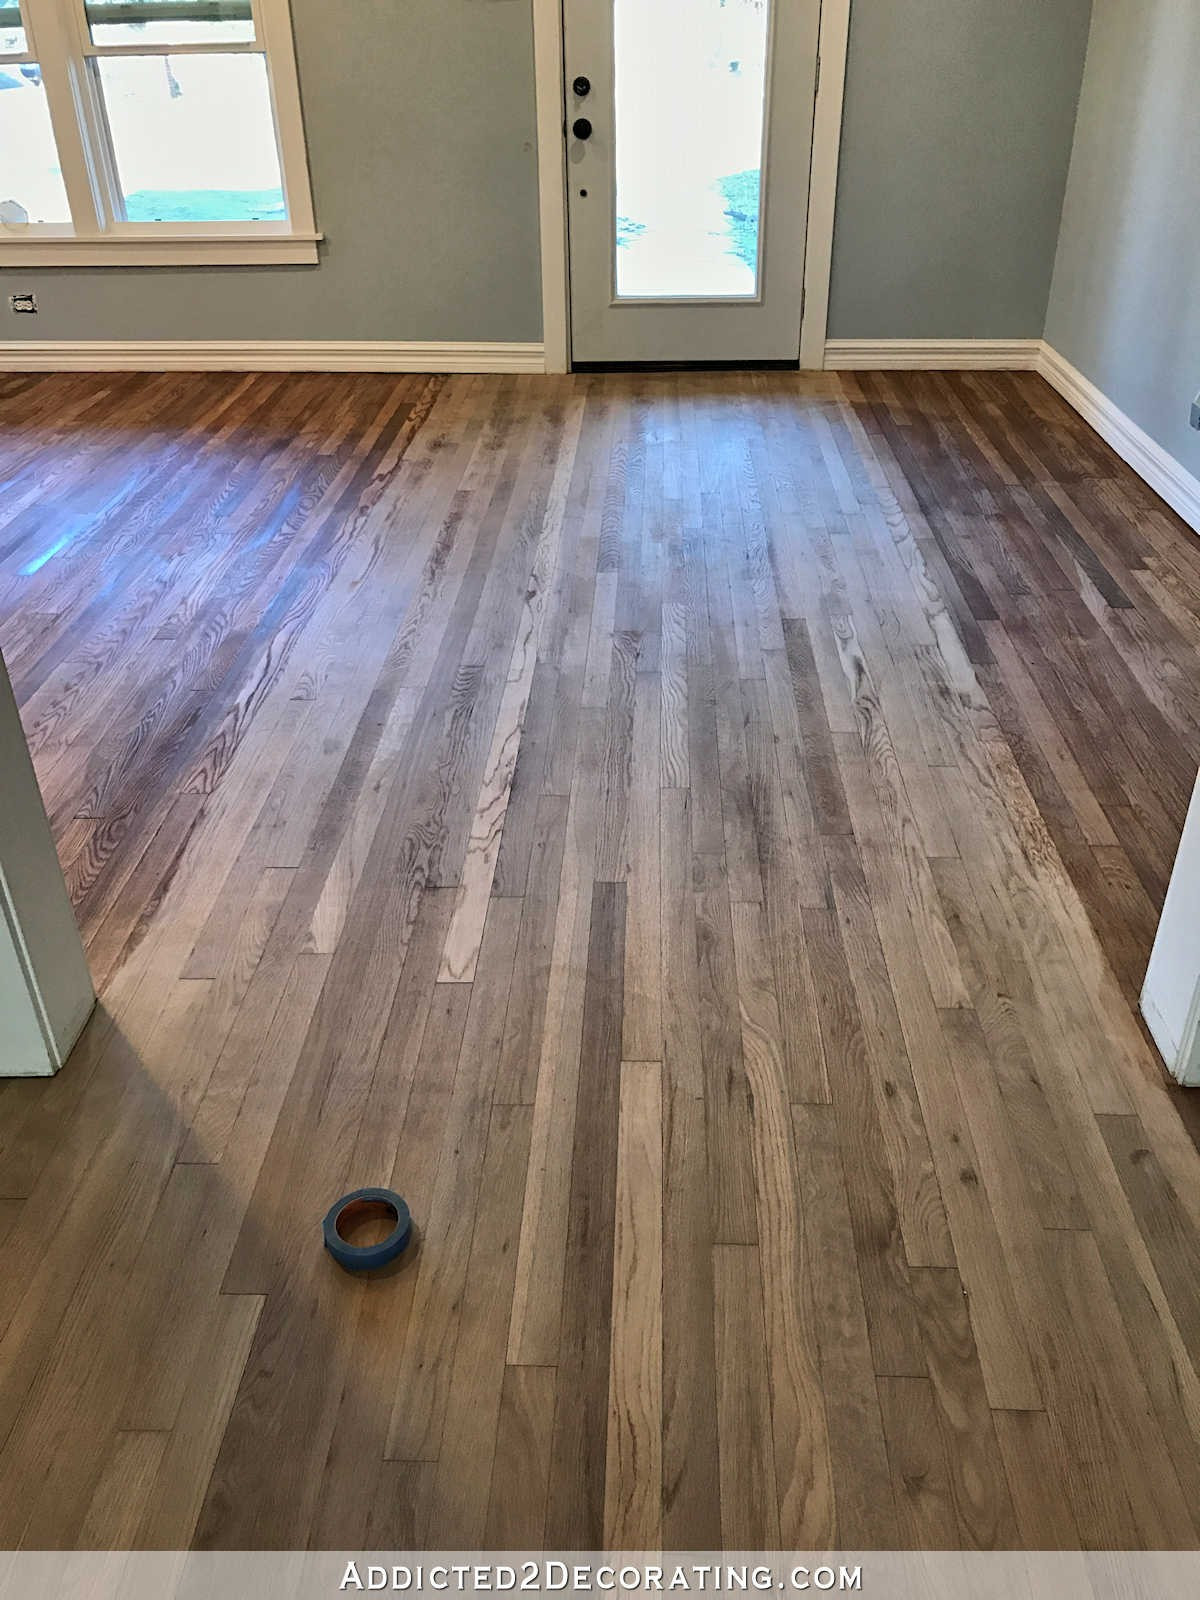 mirage red oak hardwood flooring of 15 elegant white oak hardwood flooring pictures dizpos com with regard to white oak hardwood flooring new adventures in staining my red oak hardwood floors products